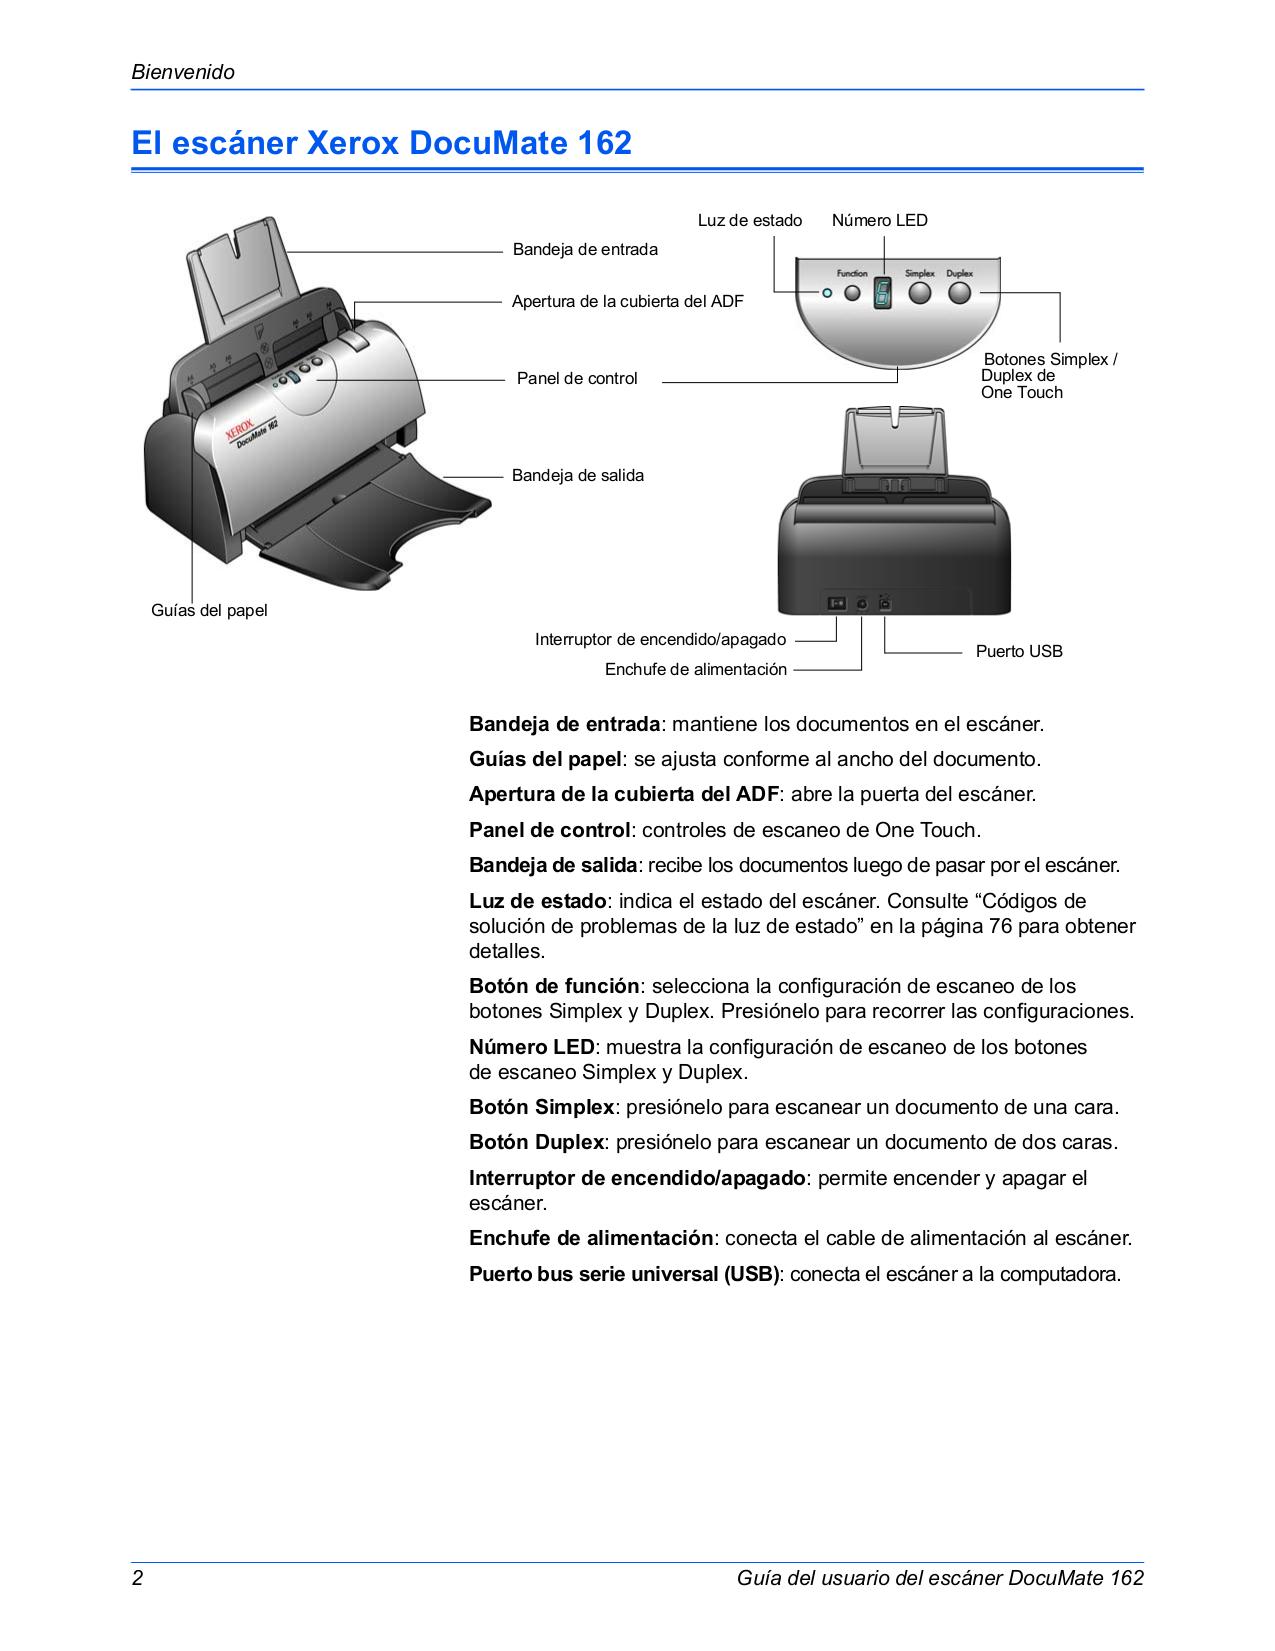 pdf manual for xerox scanner documate 162 rh umlib com Xerox DocuMate 152 Software xerox documate 162 user manual